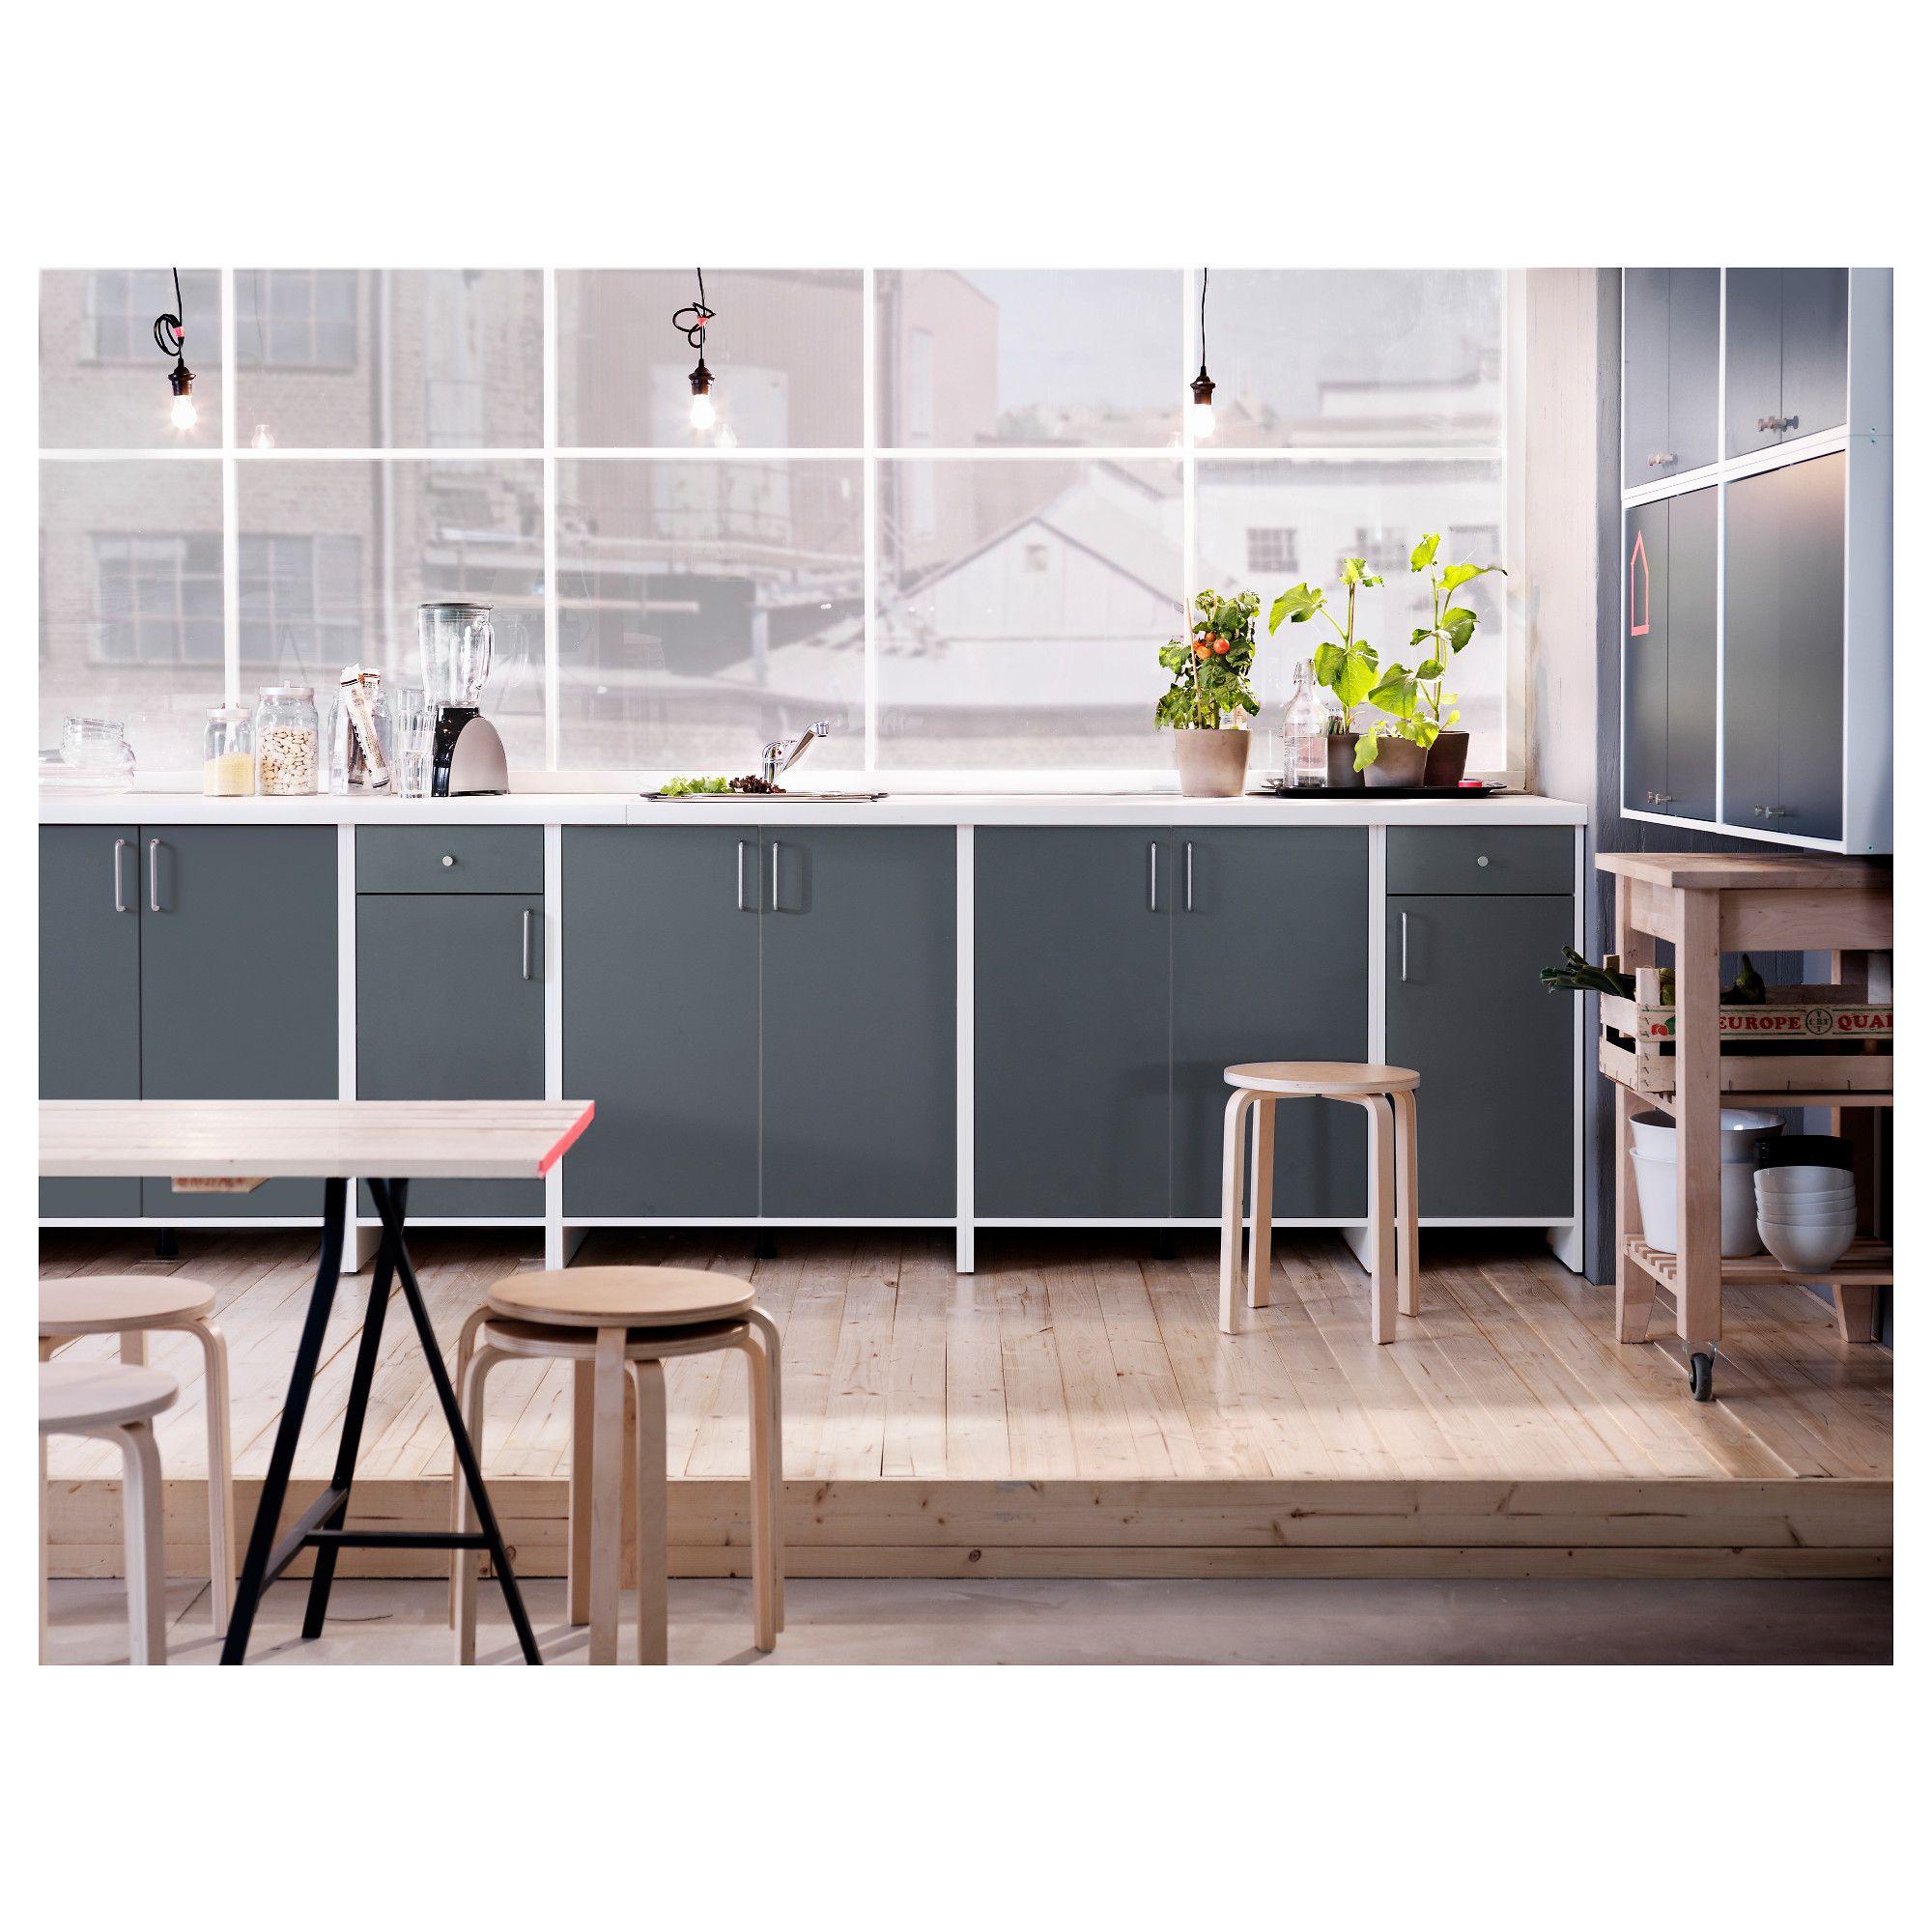 Fyndig Küche Grau | Fabelhafte Dekoration Einfach Fyndig Kuche ...